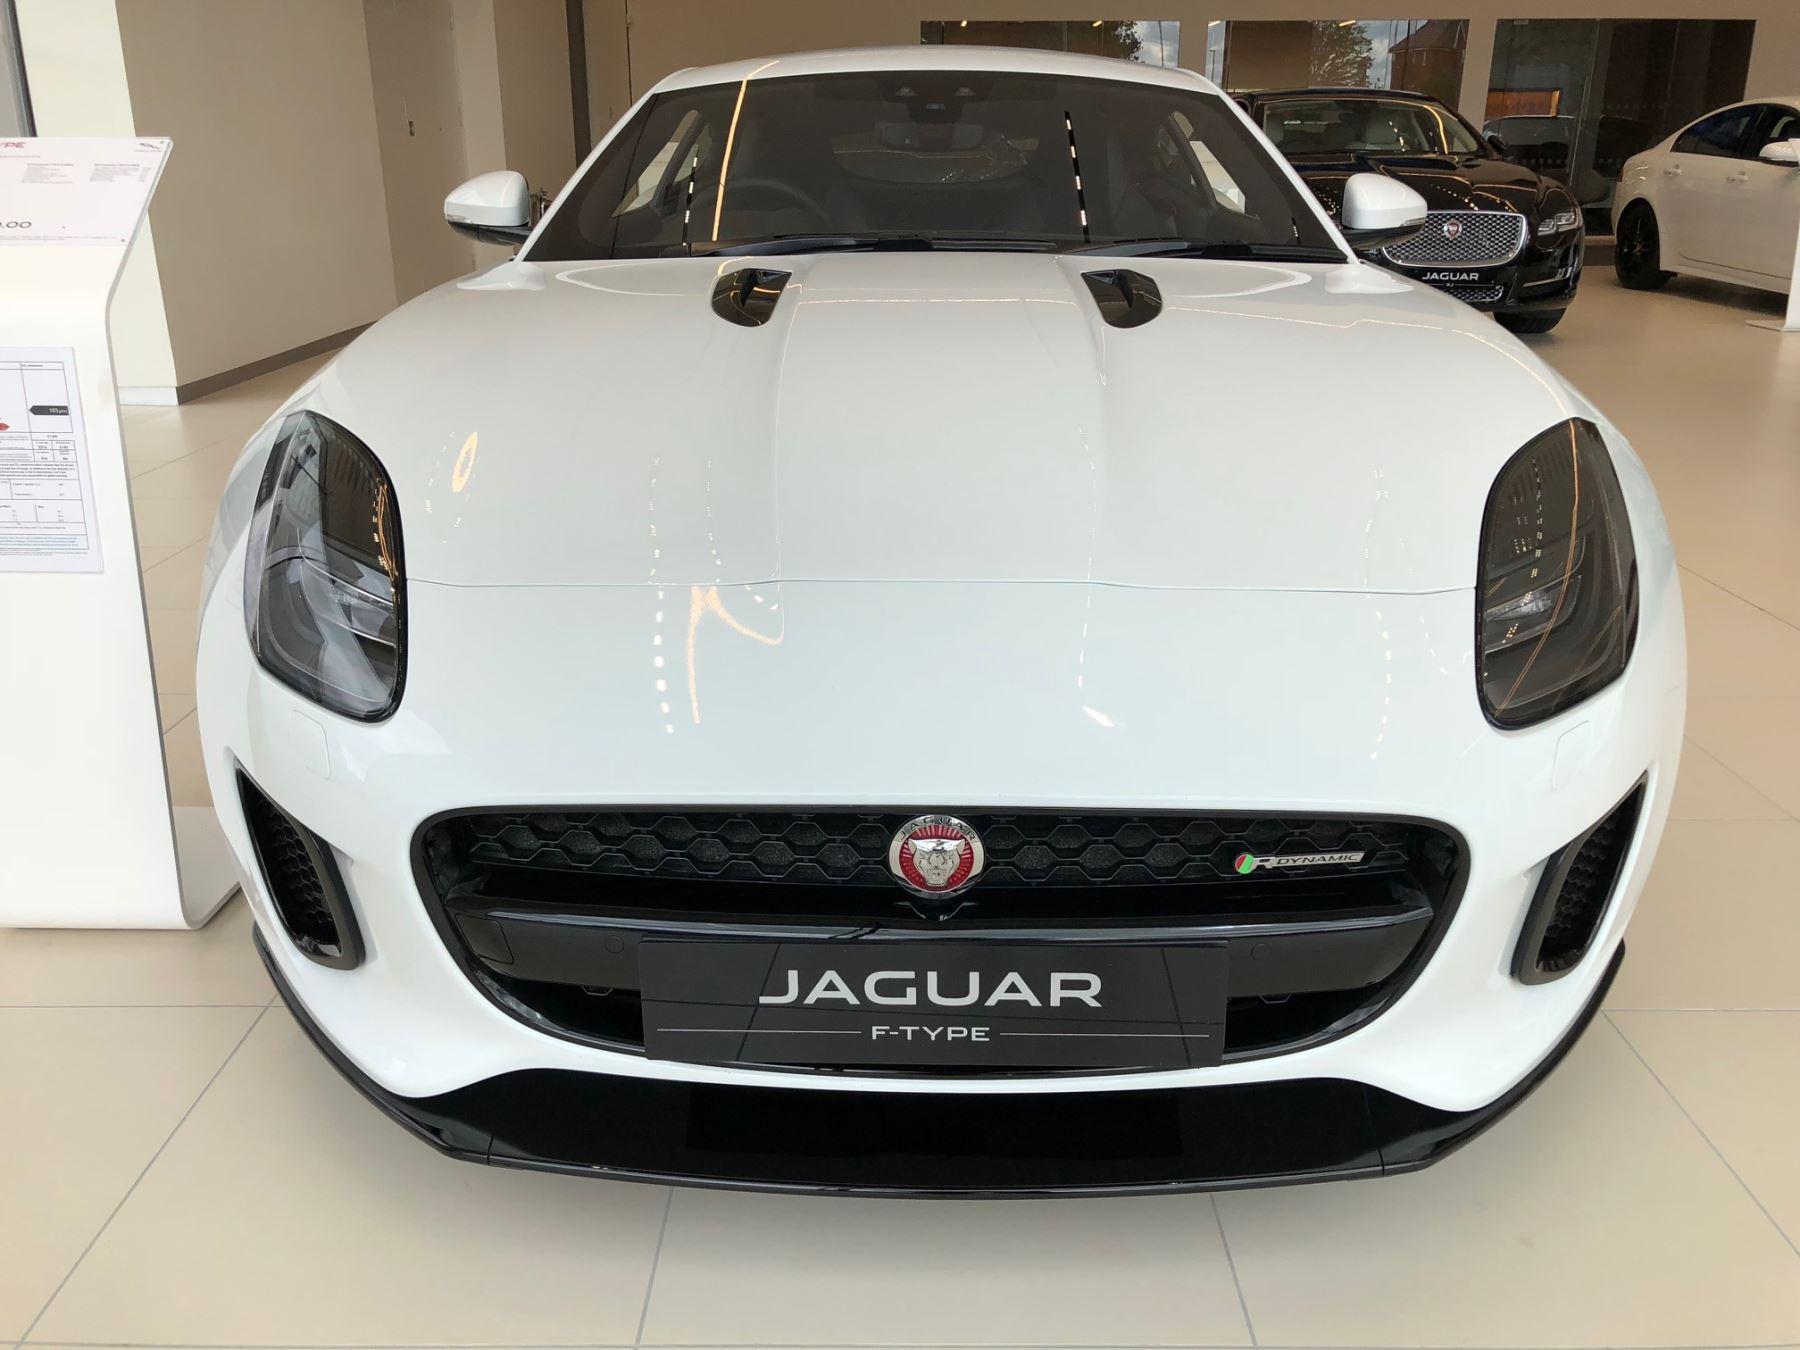 Jaguar F-TYPE 2.0 R-Dynamic image 2